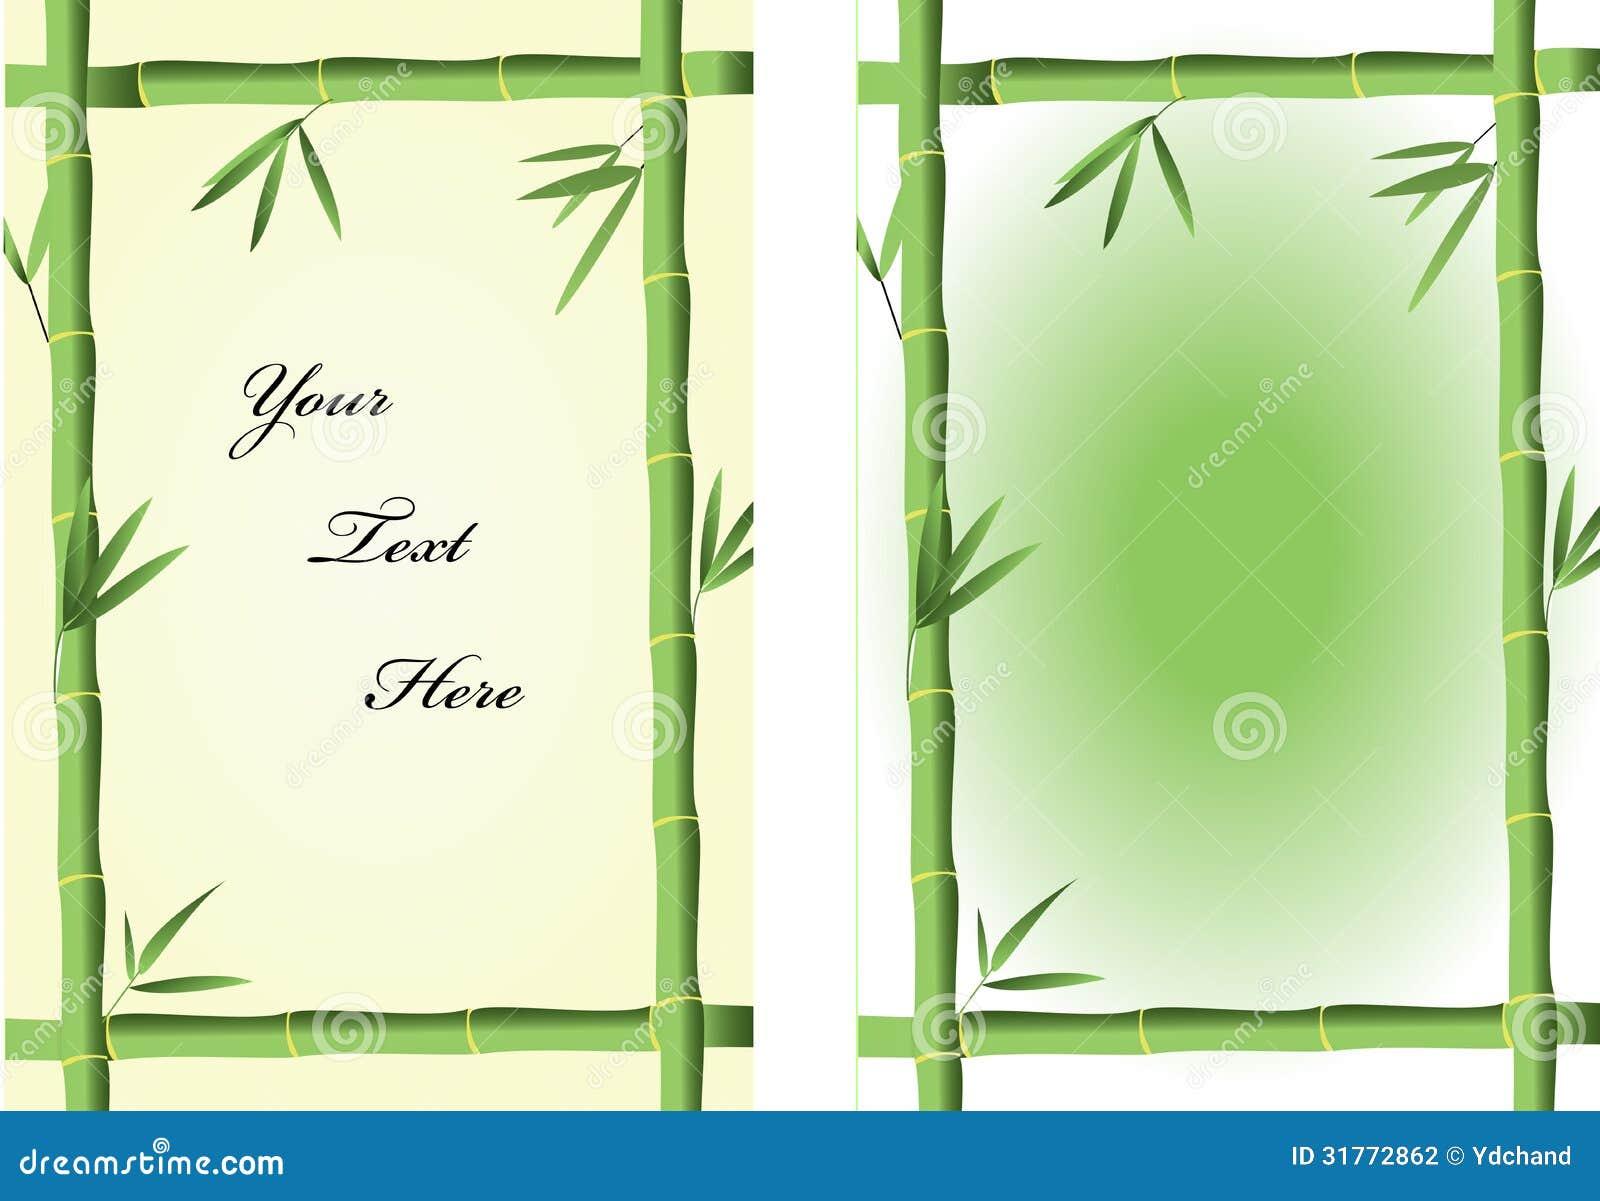 Bamboo Frames Illustration 31772862 - Megapixl